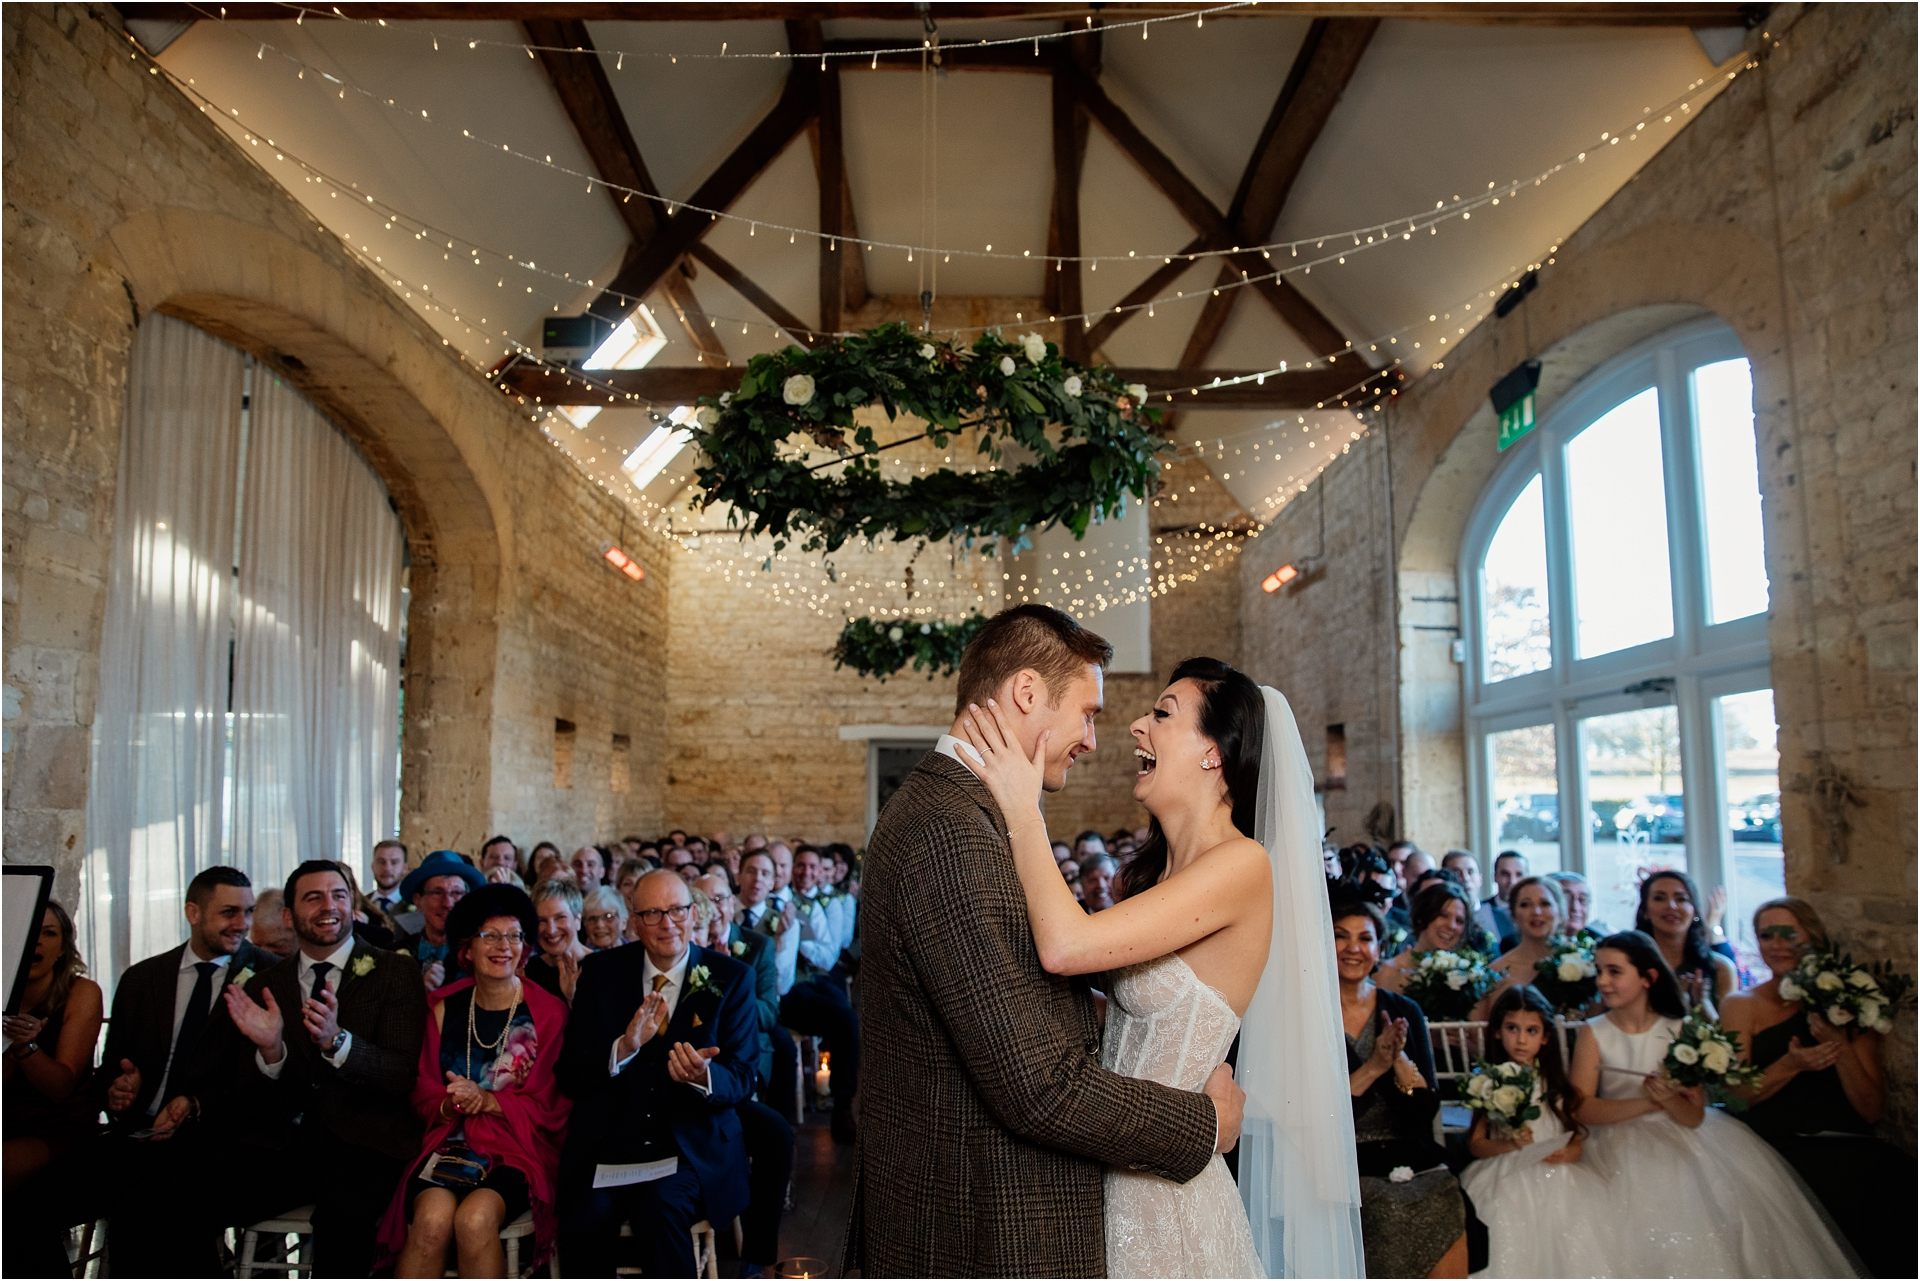 Lapstone Barn wedding ceremony